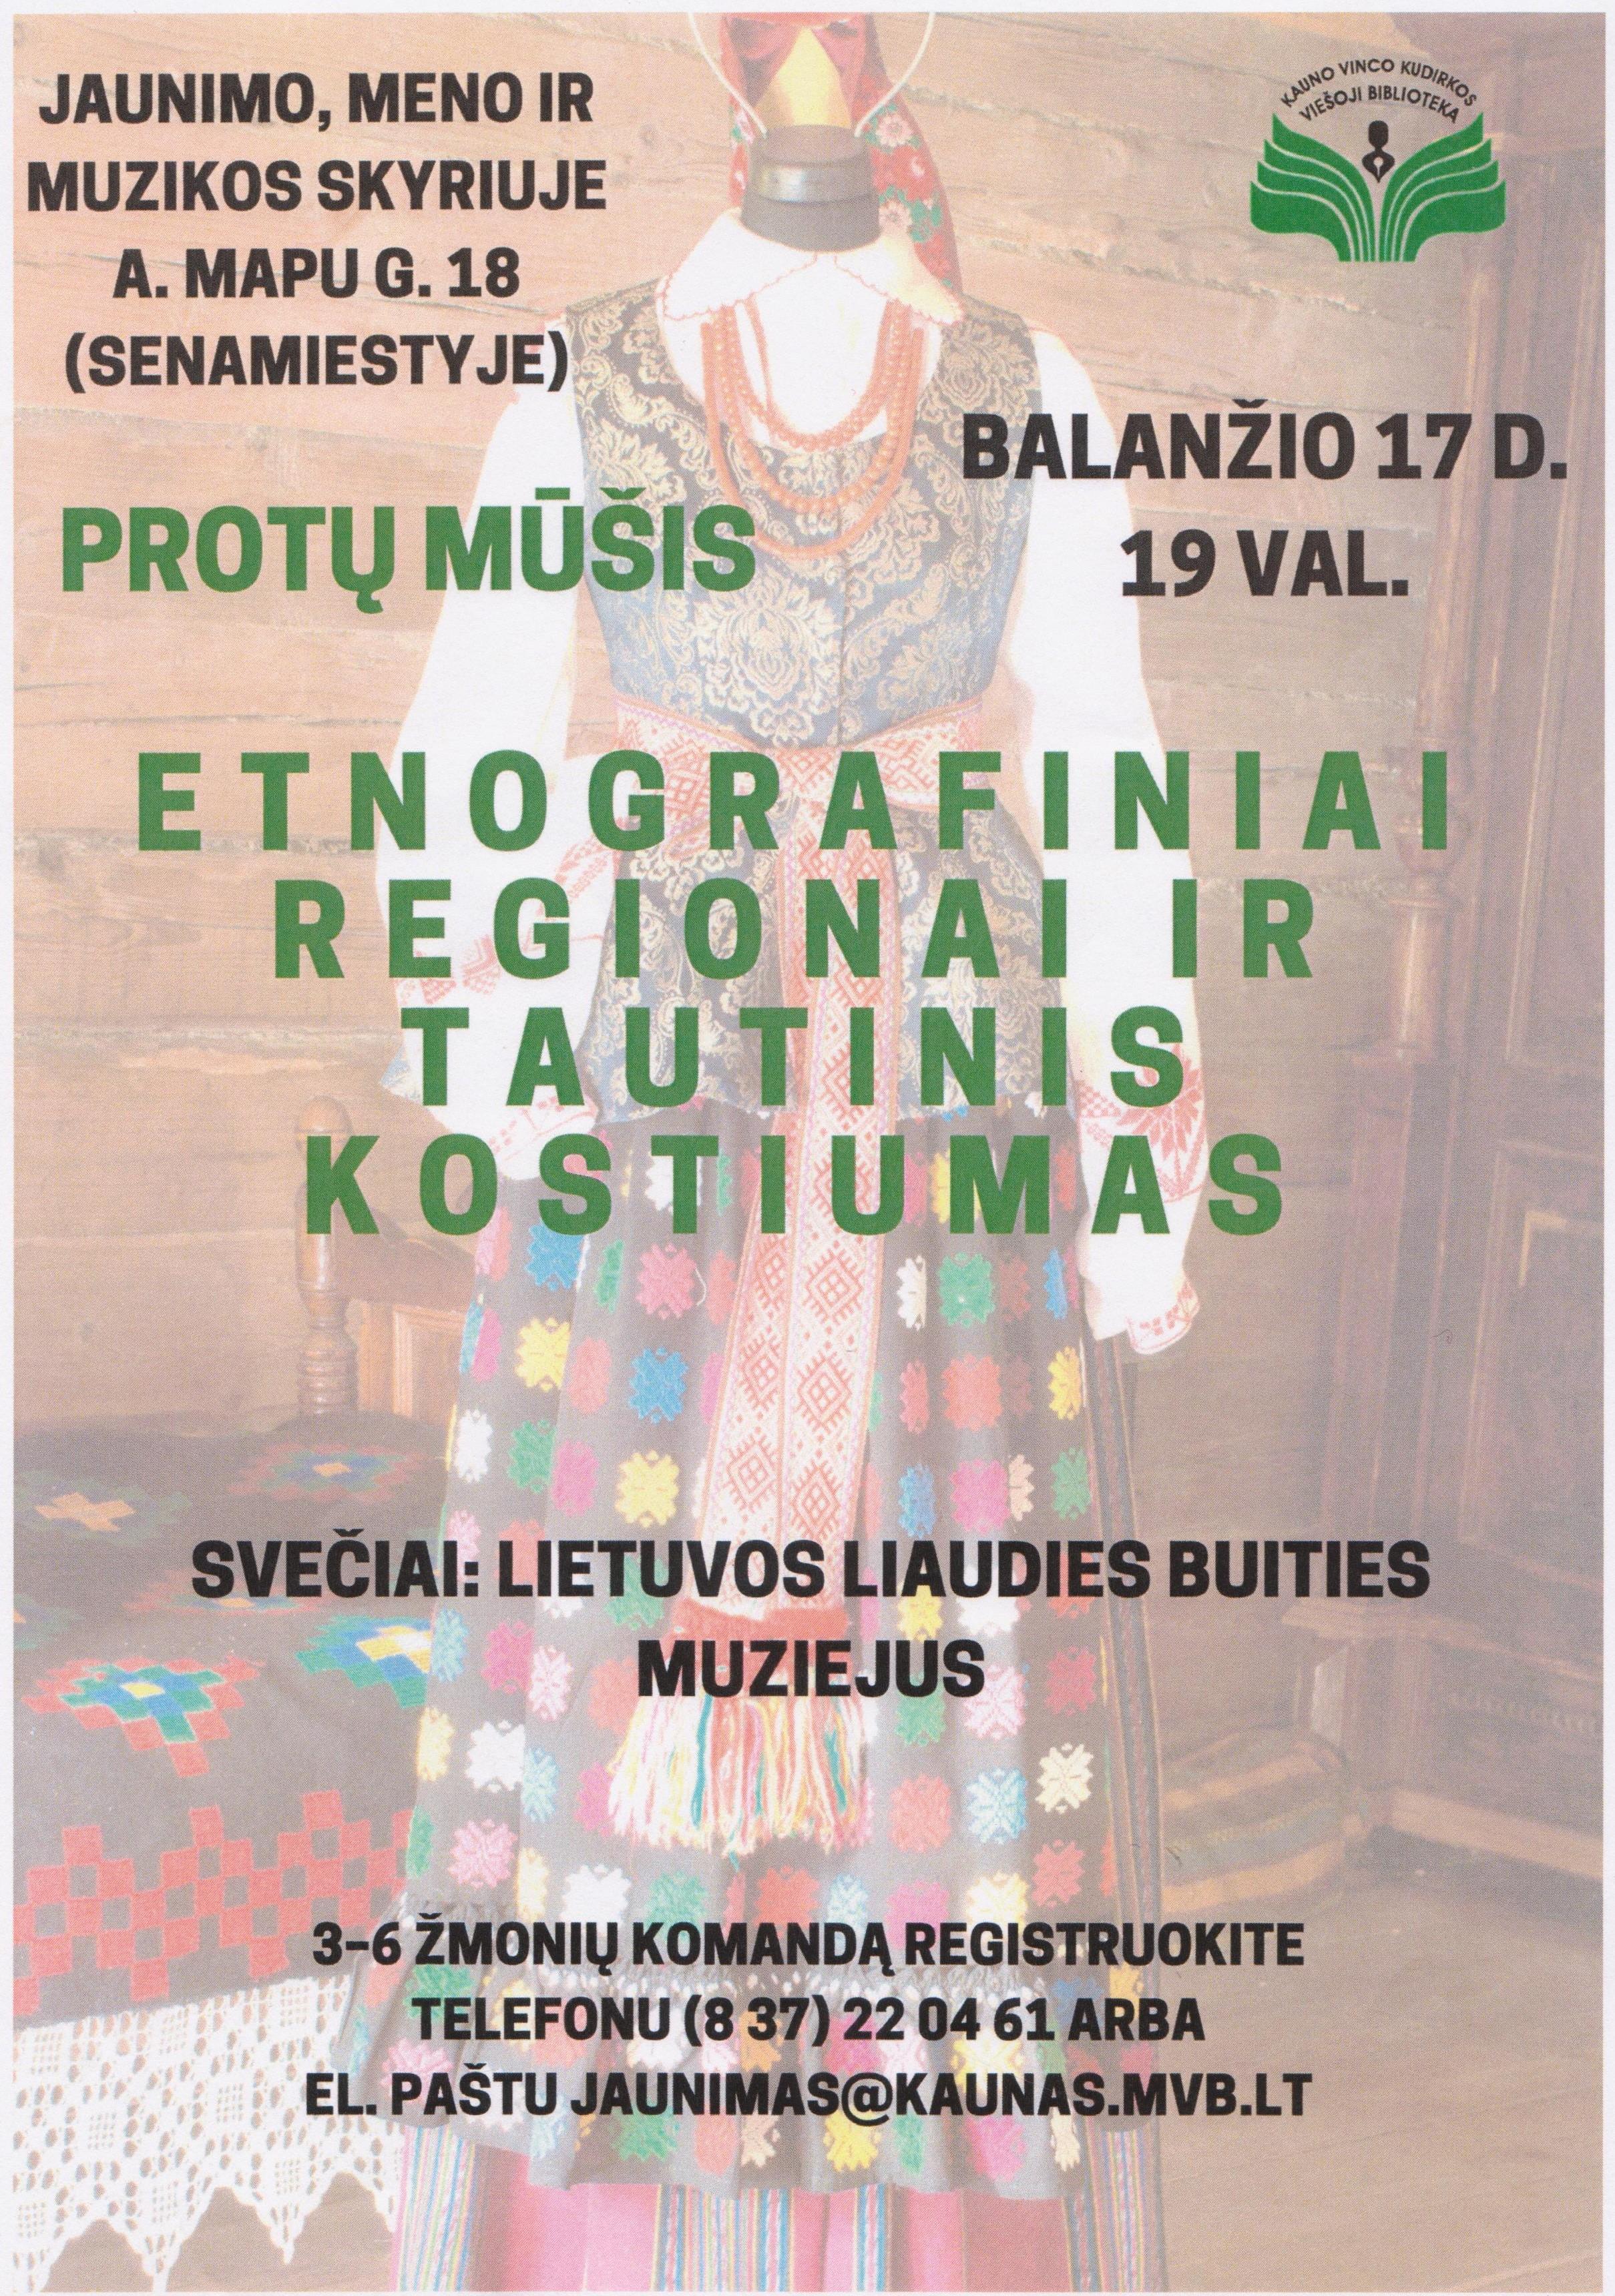 etnografiniai regionai